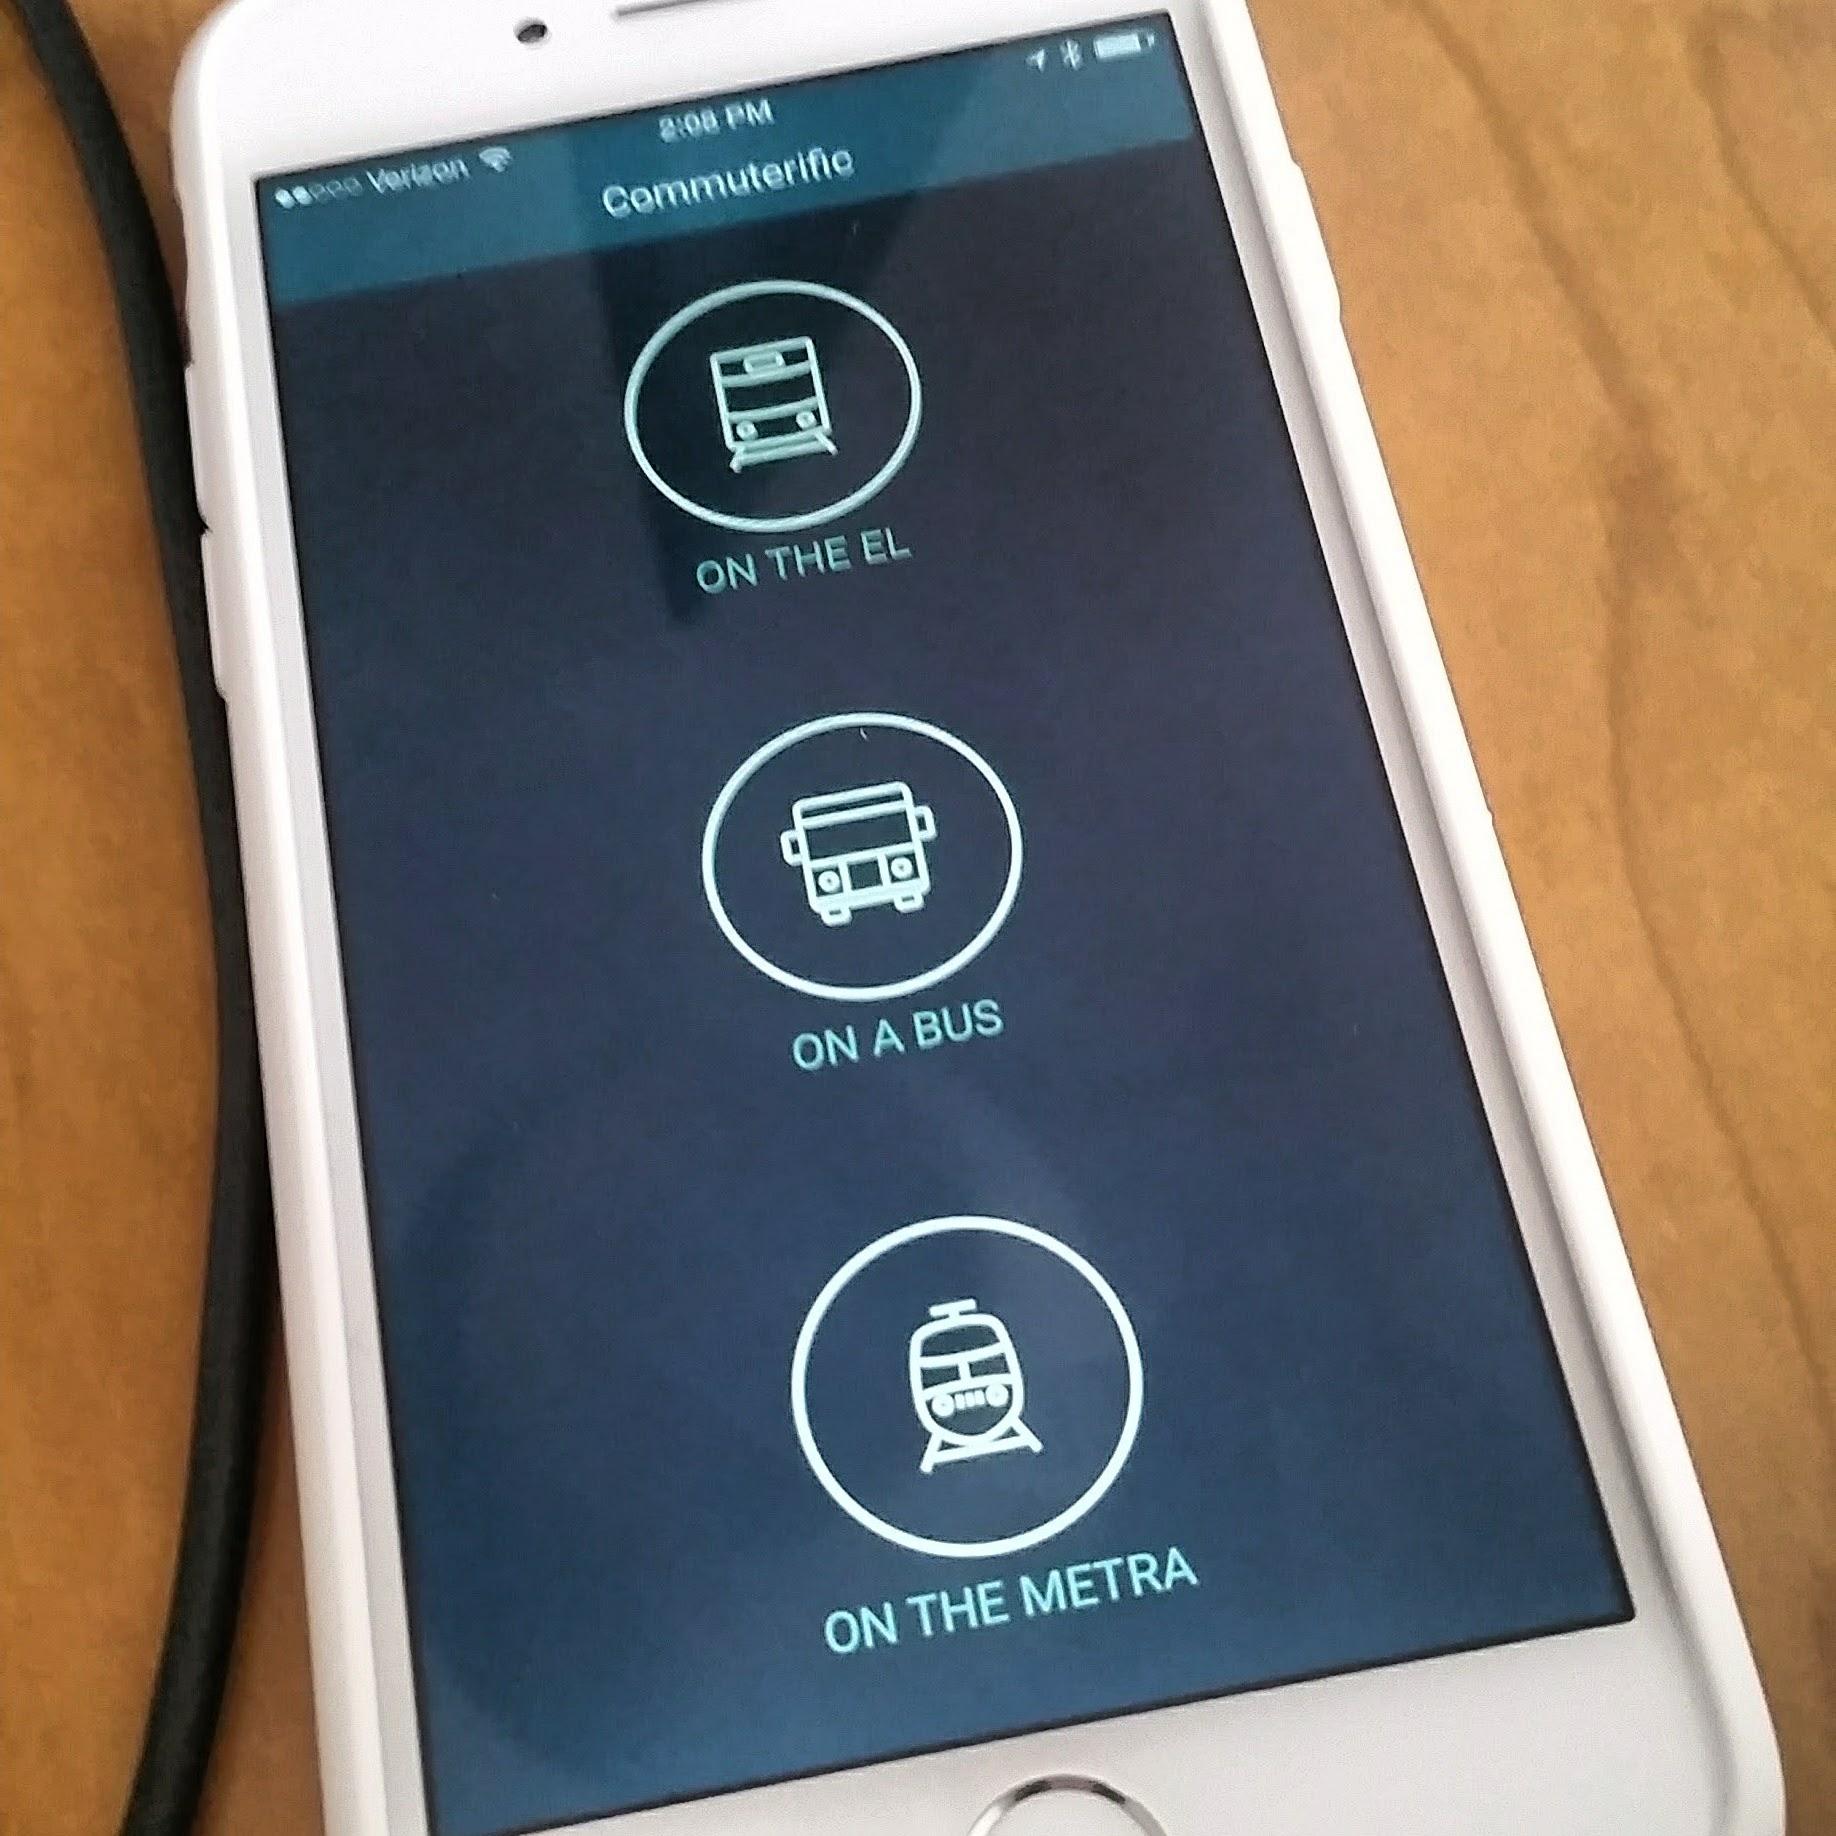 Drop a pin near a bus stop or select an active Metra or CTA train stop to set Commuterific.